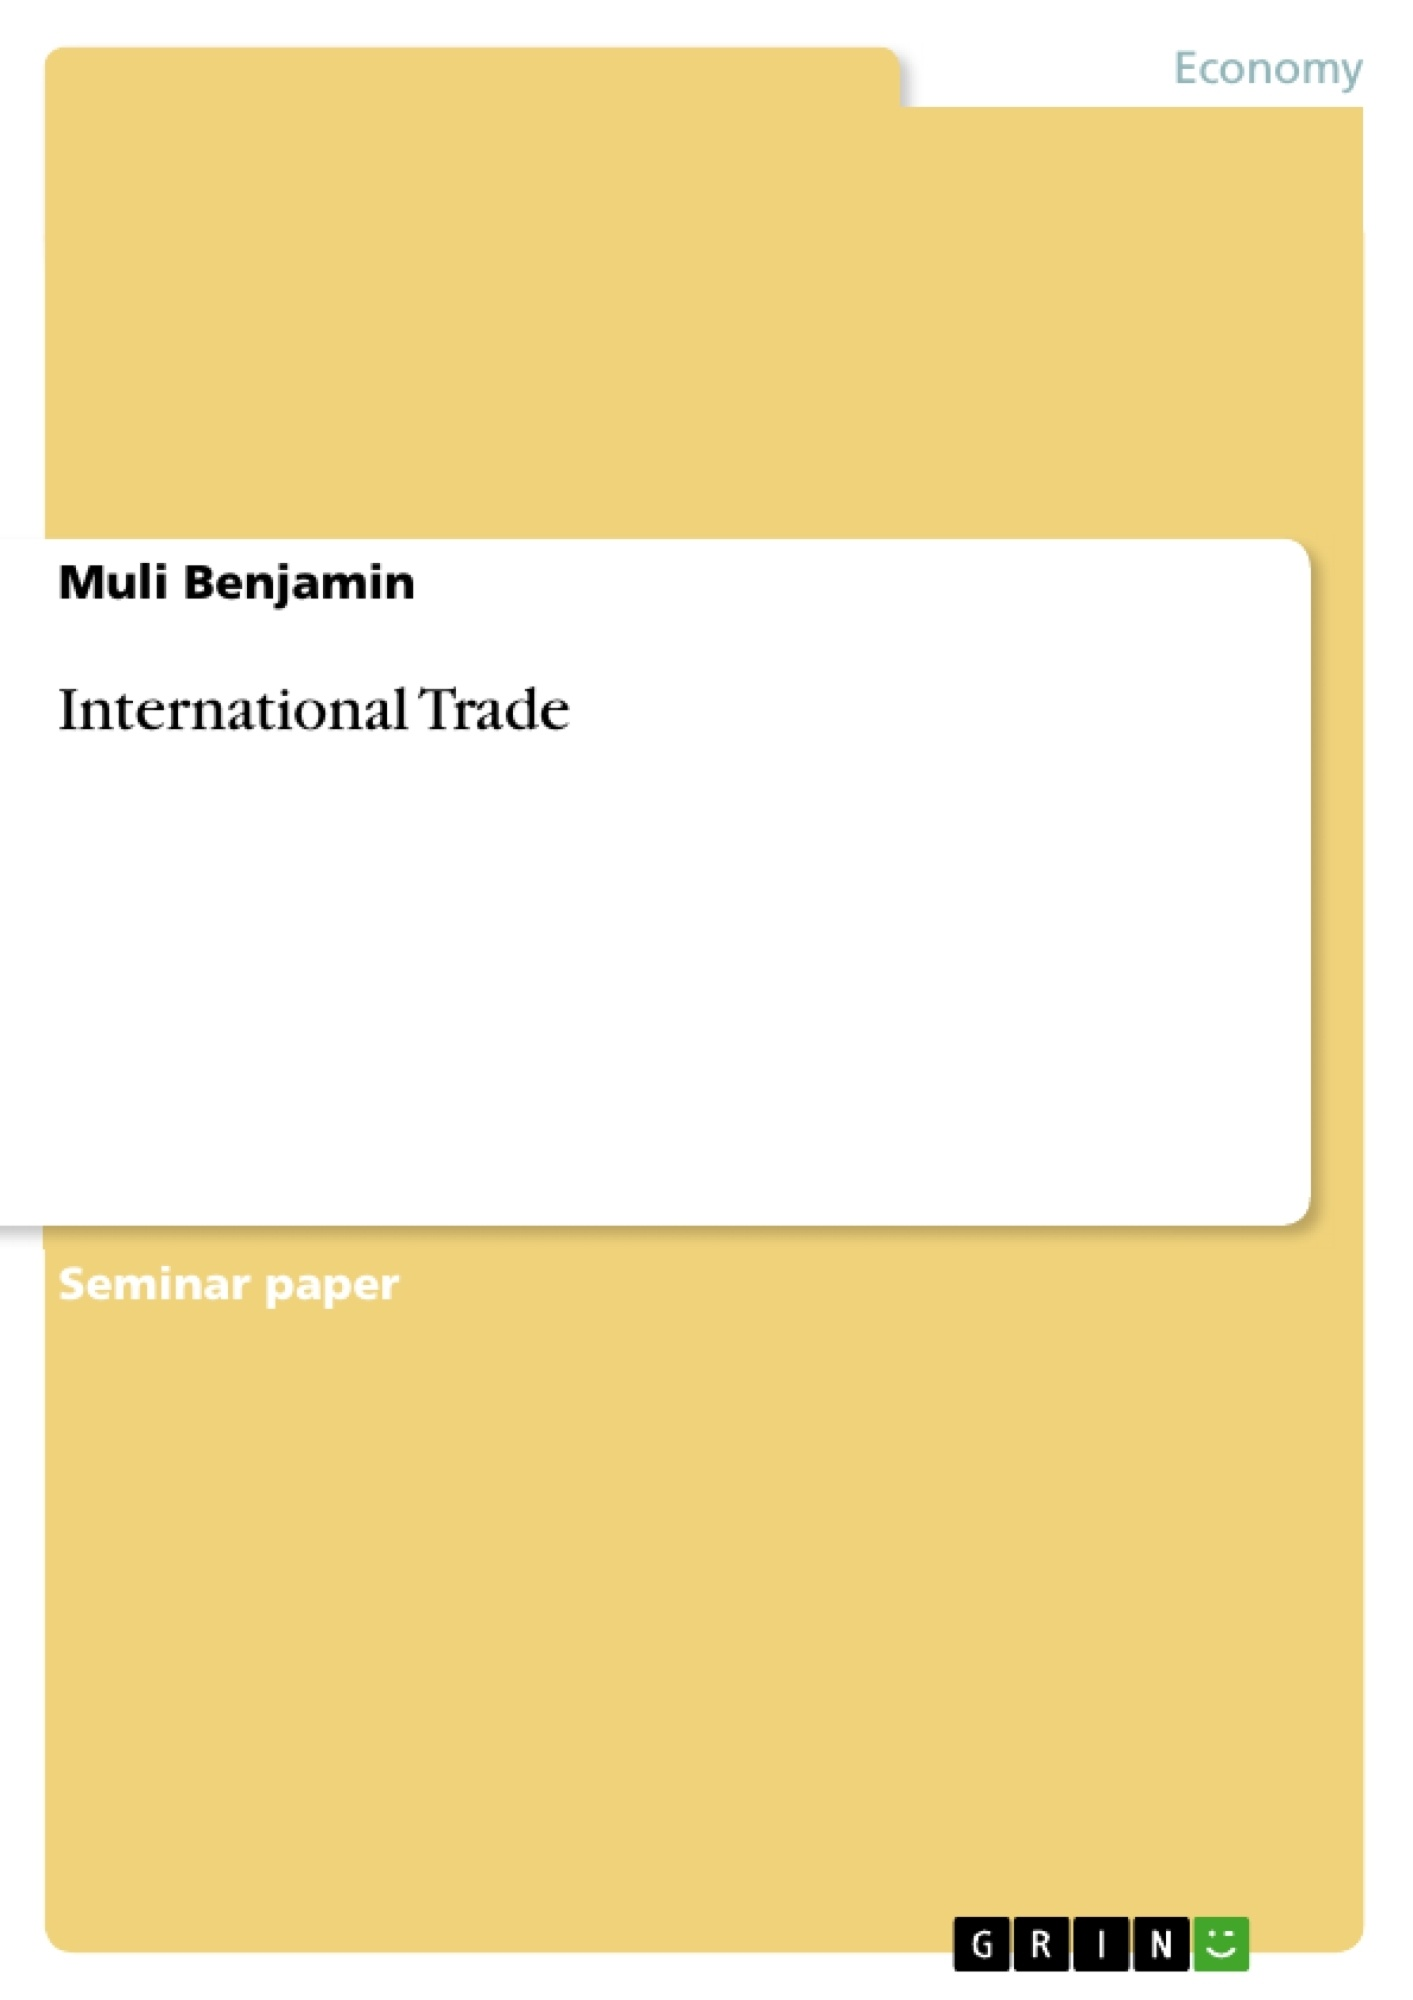 Title: International Trade